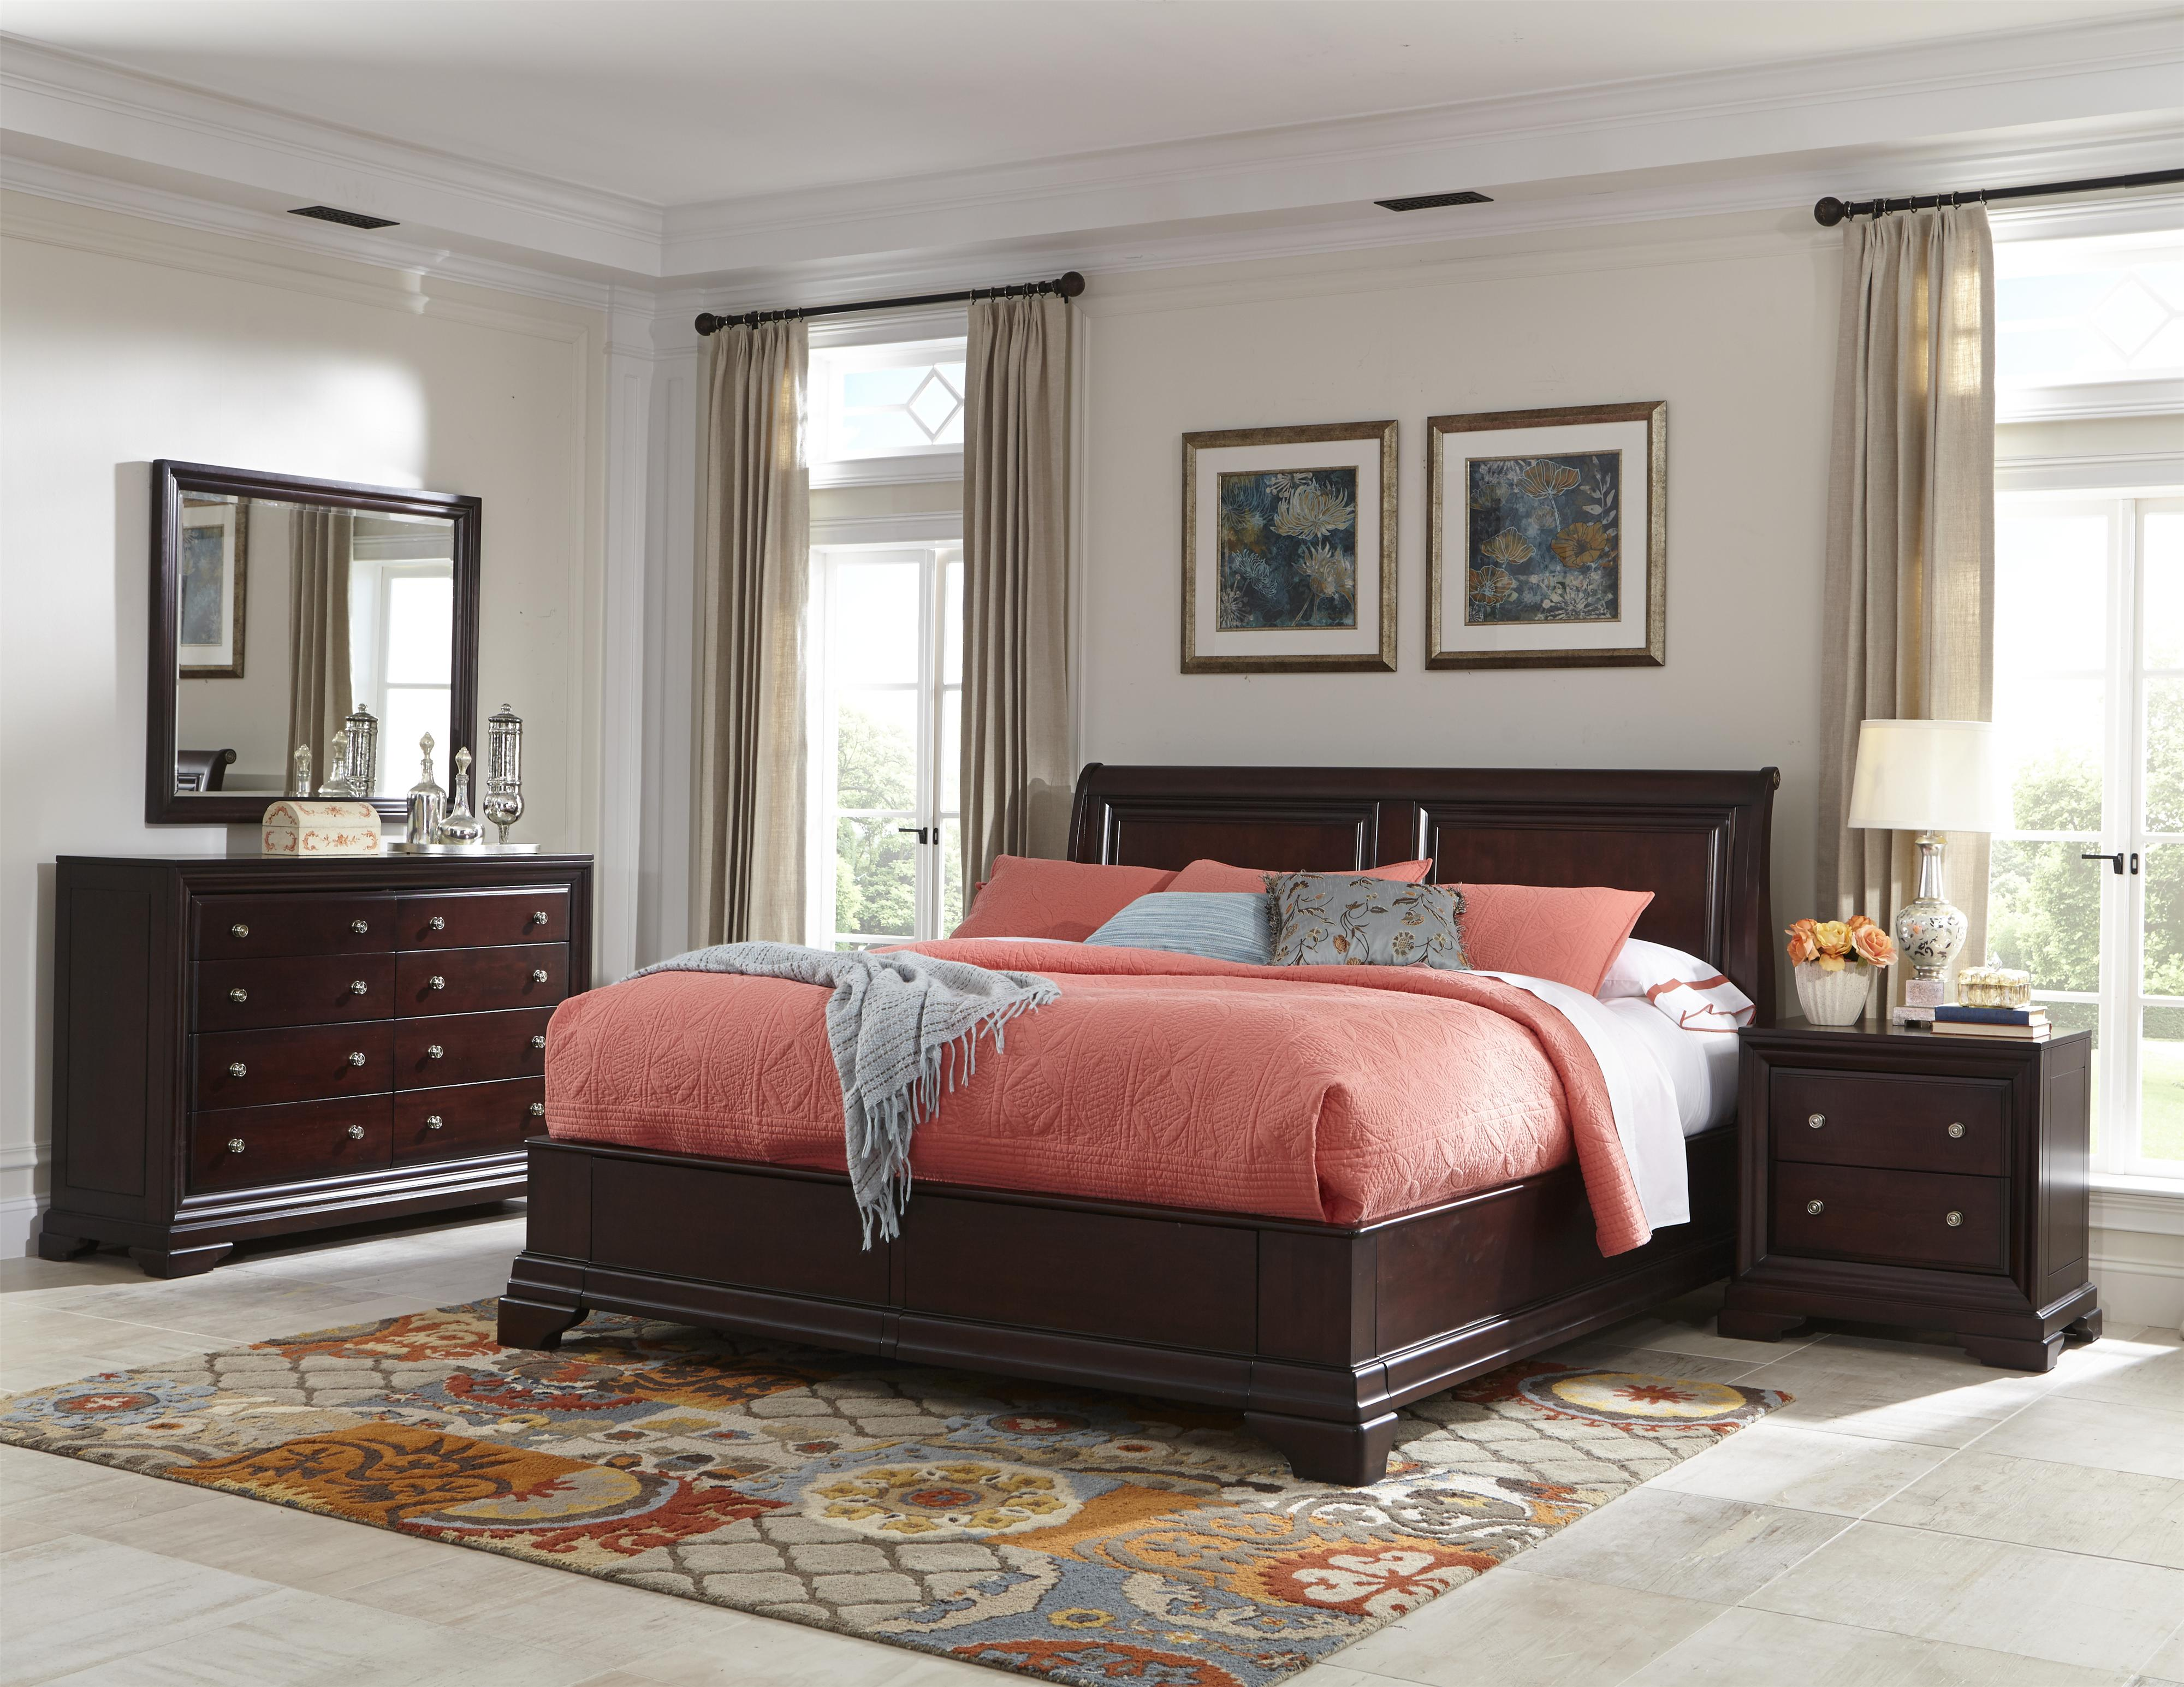 Cresent Fine Furniture Newport Cal King Bedroom Group - Item Number: 1800 CK Bedroom Group 1